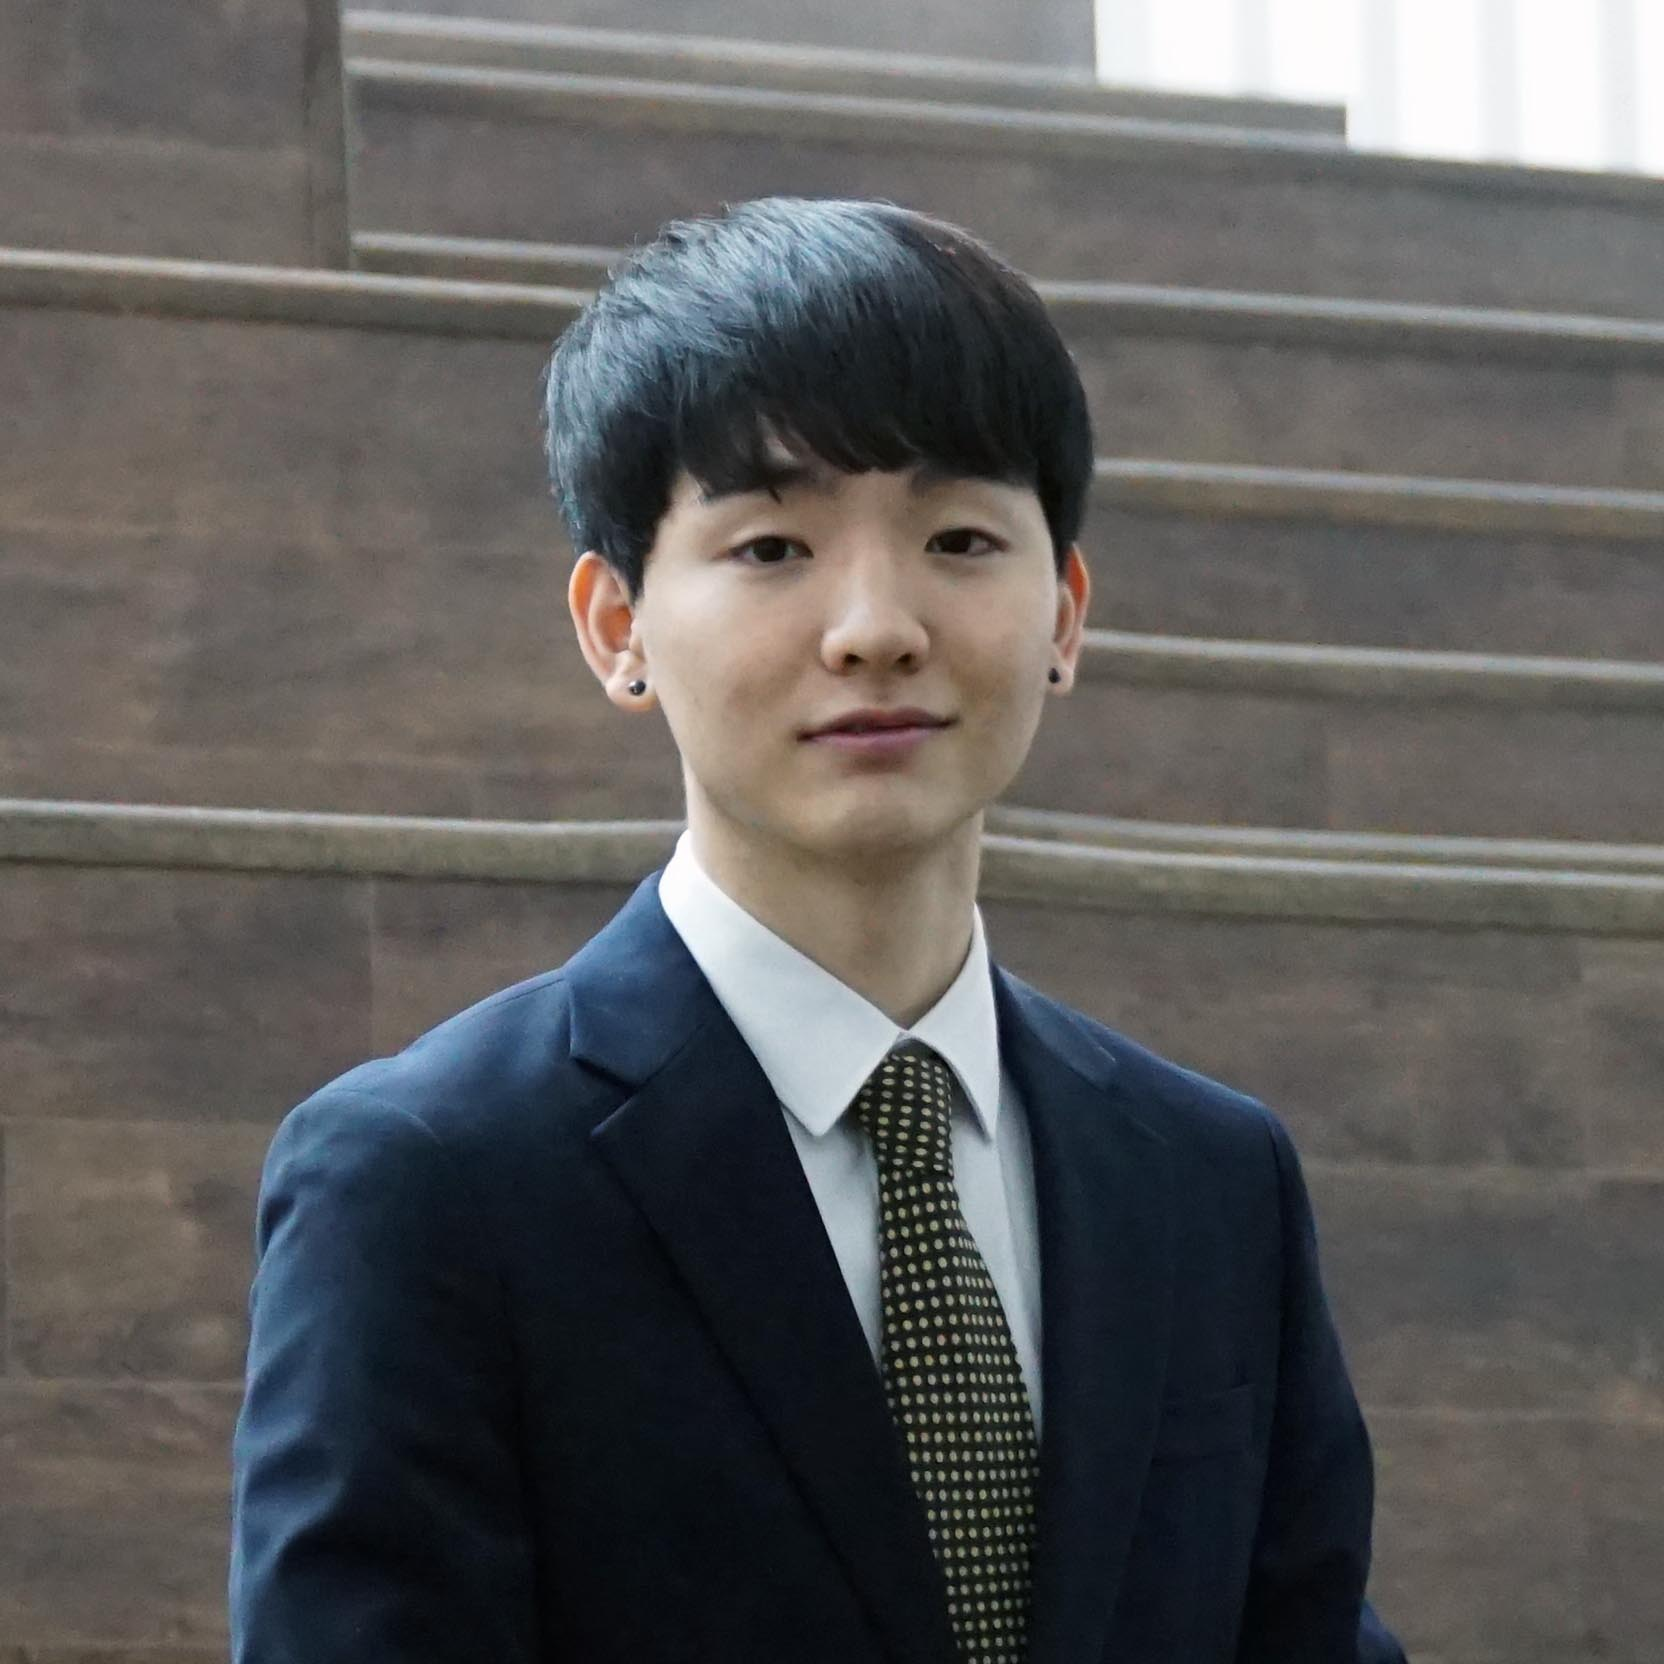 Jung Hyun Choi